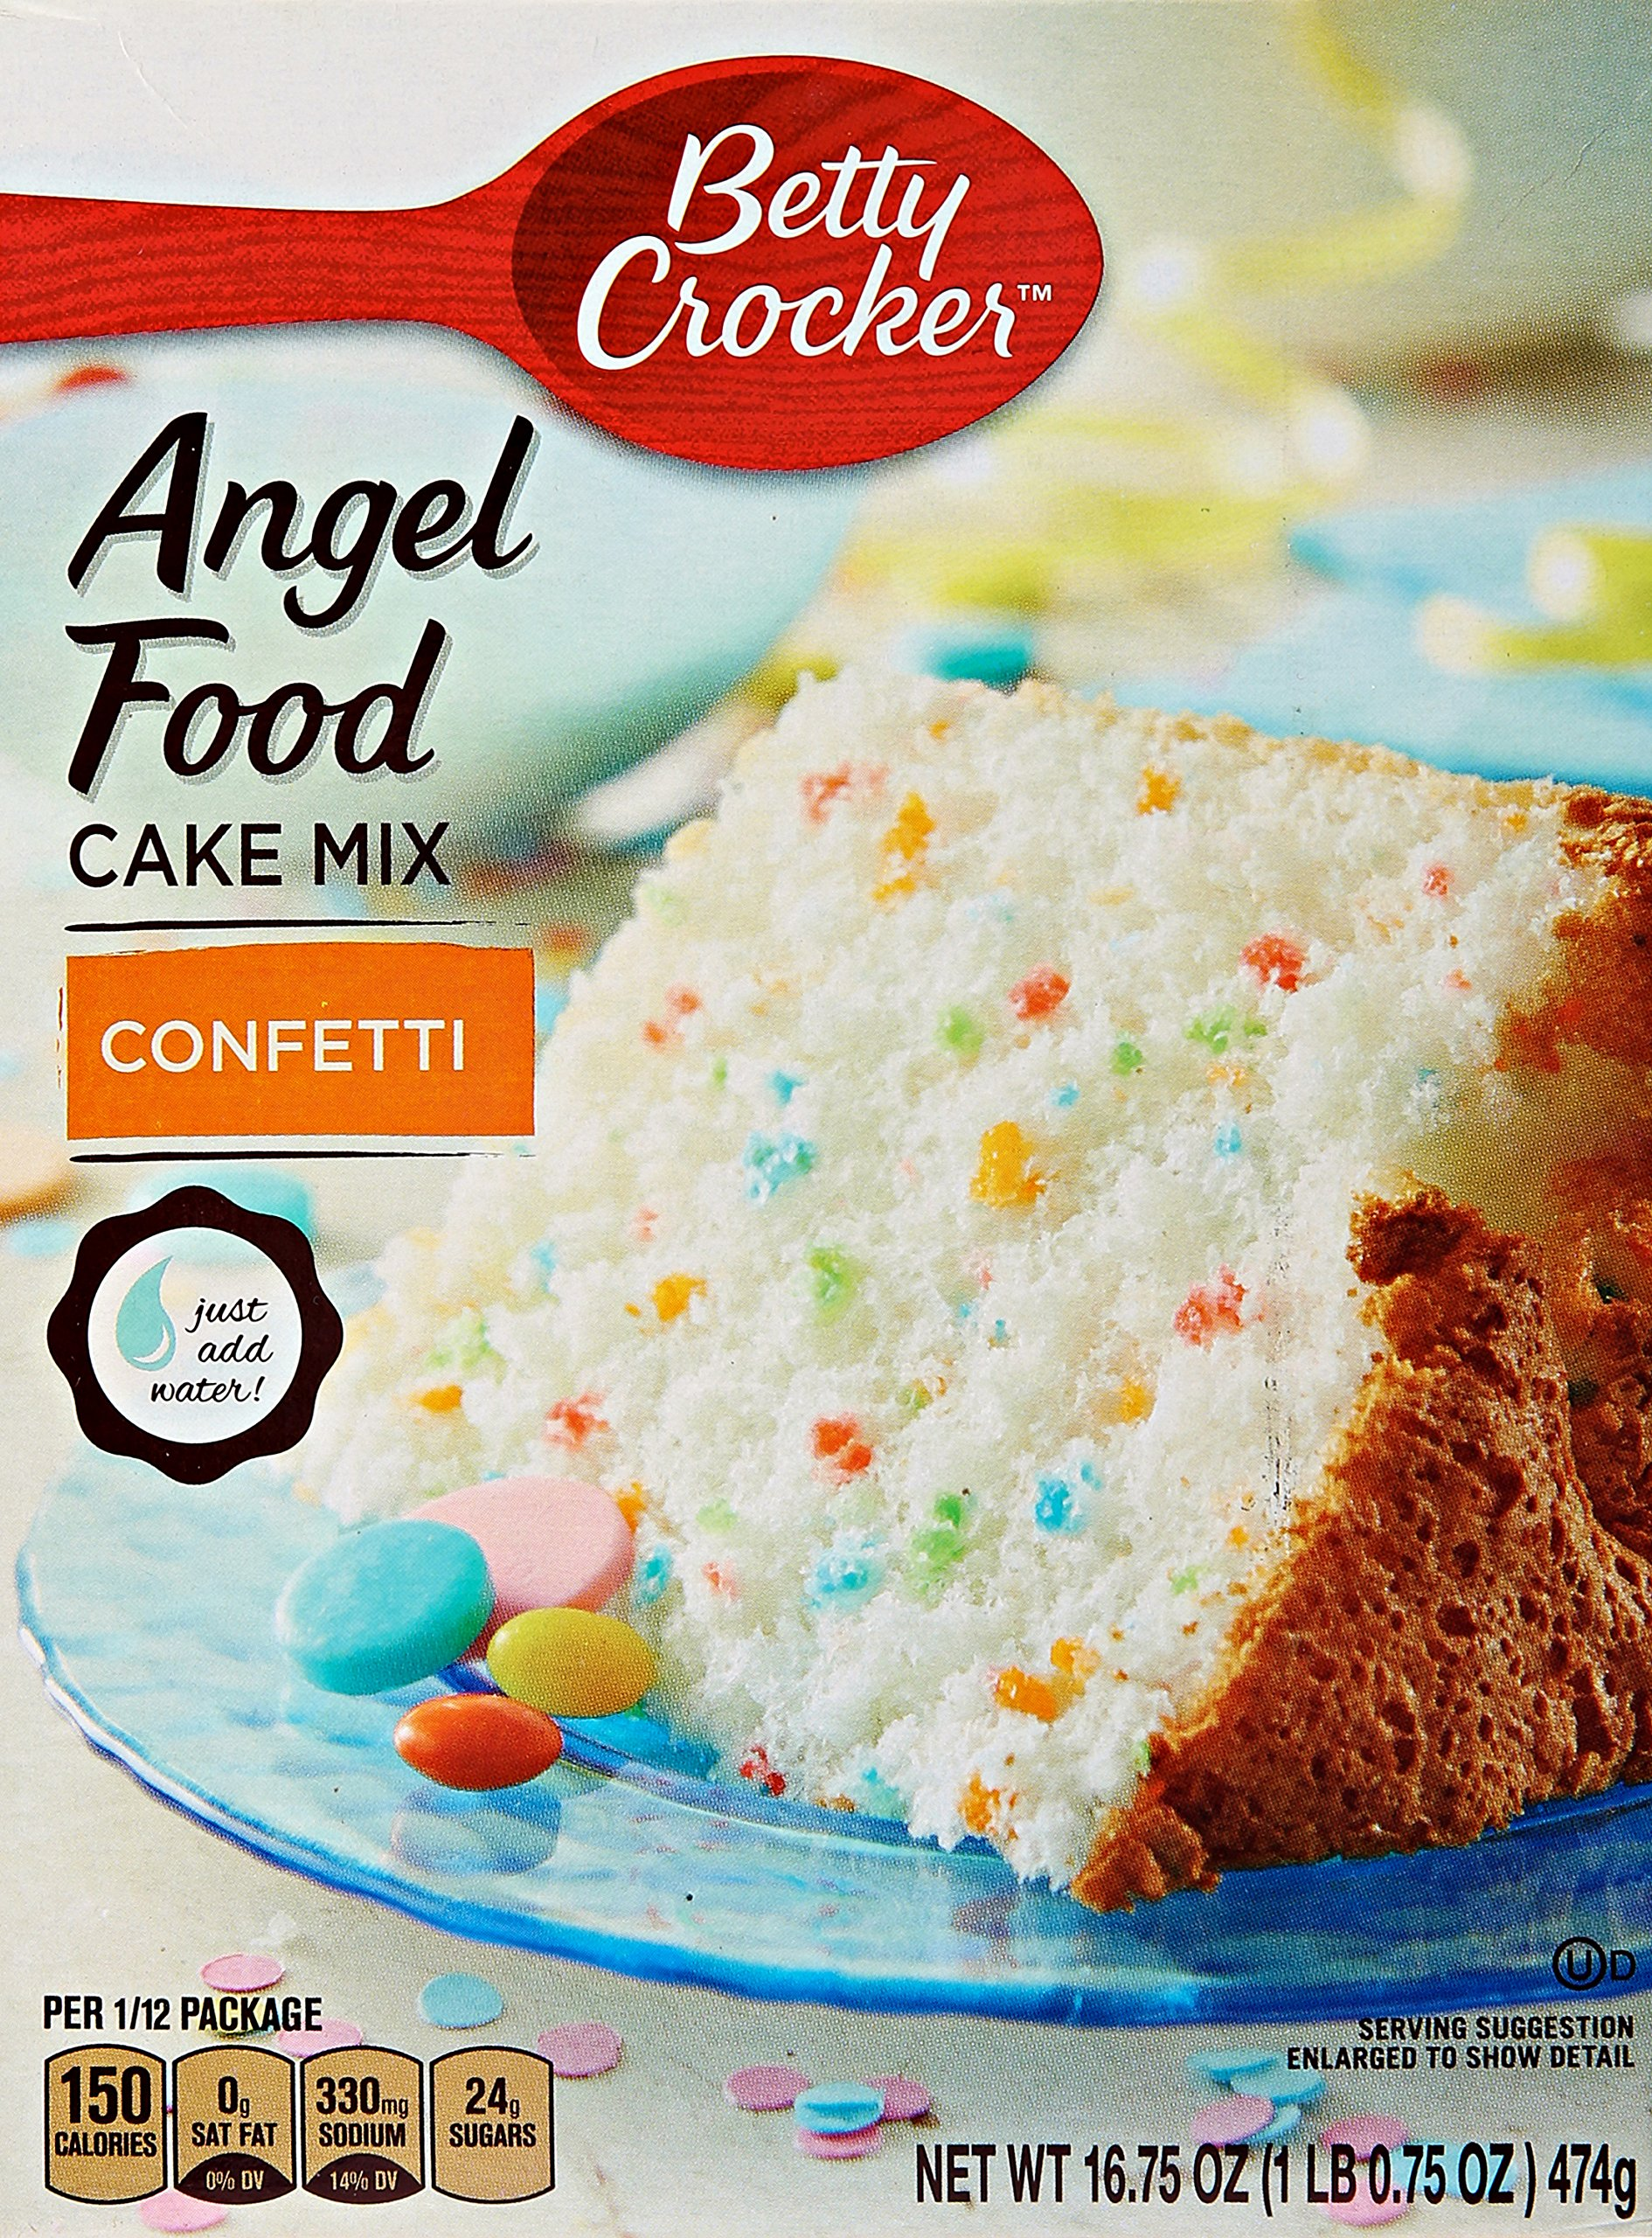 Betty Crocker Fat Free Cake Mix Angel Food Confetti 16.75 oz Box